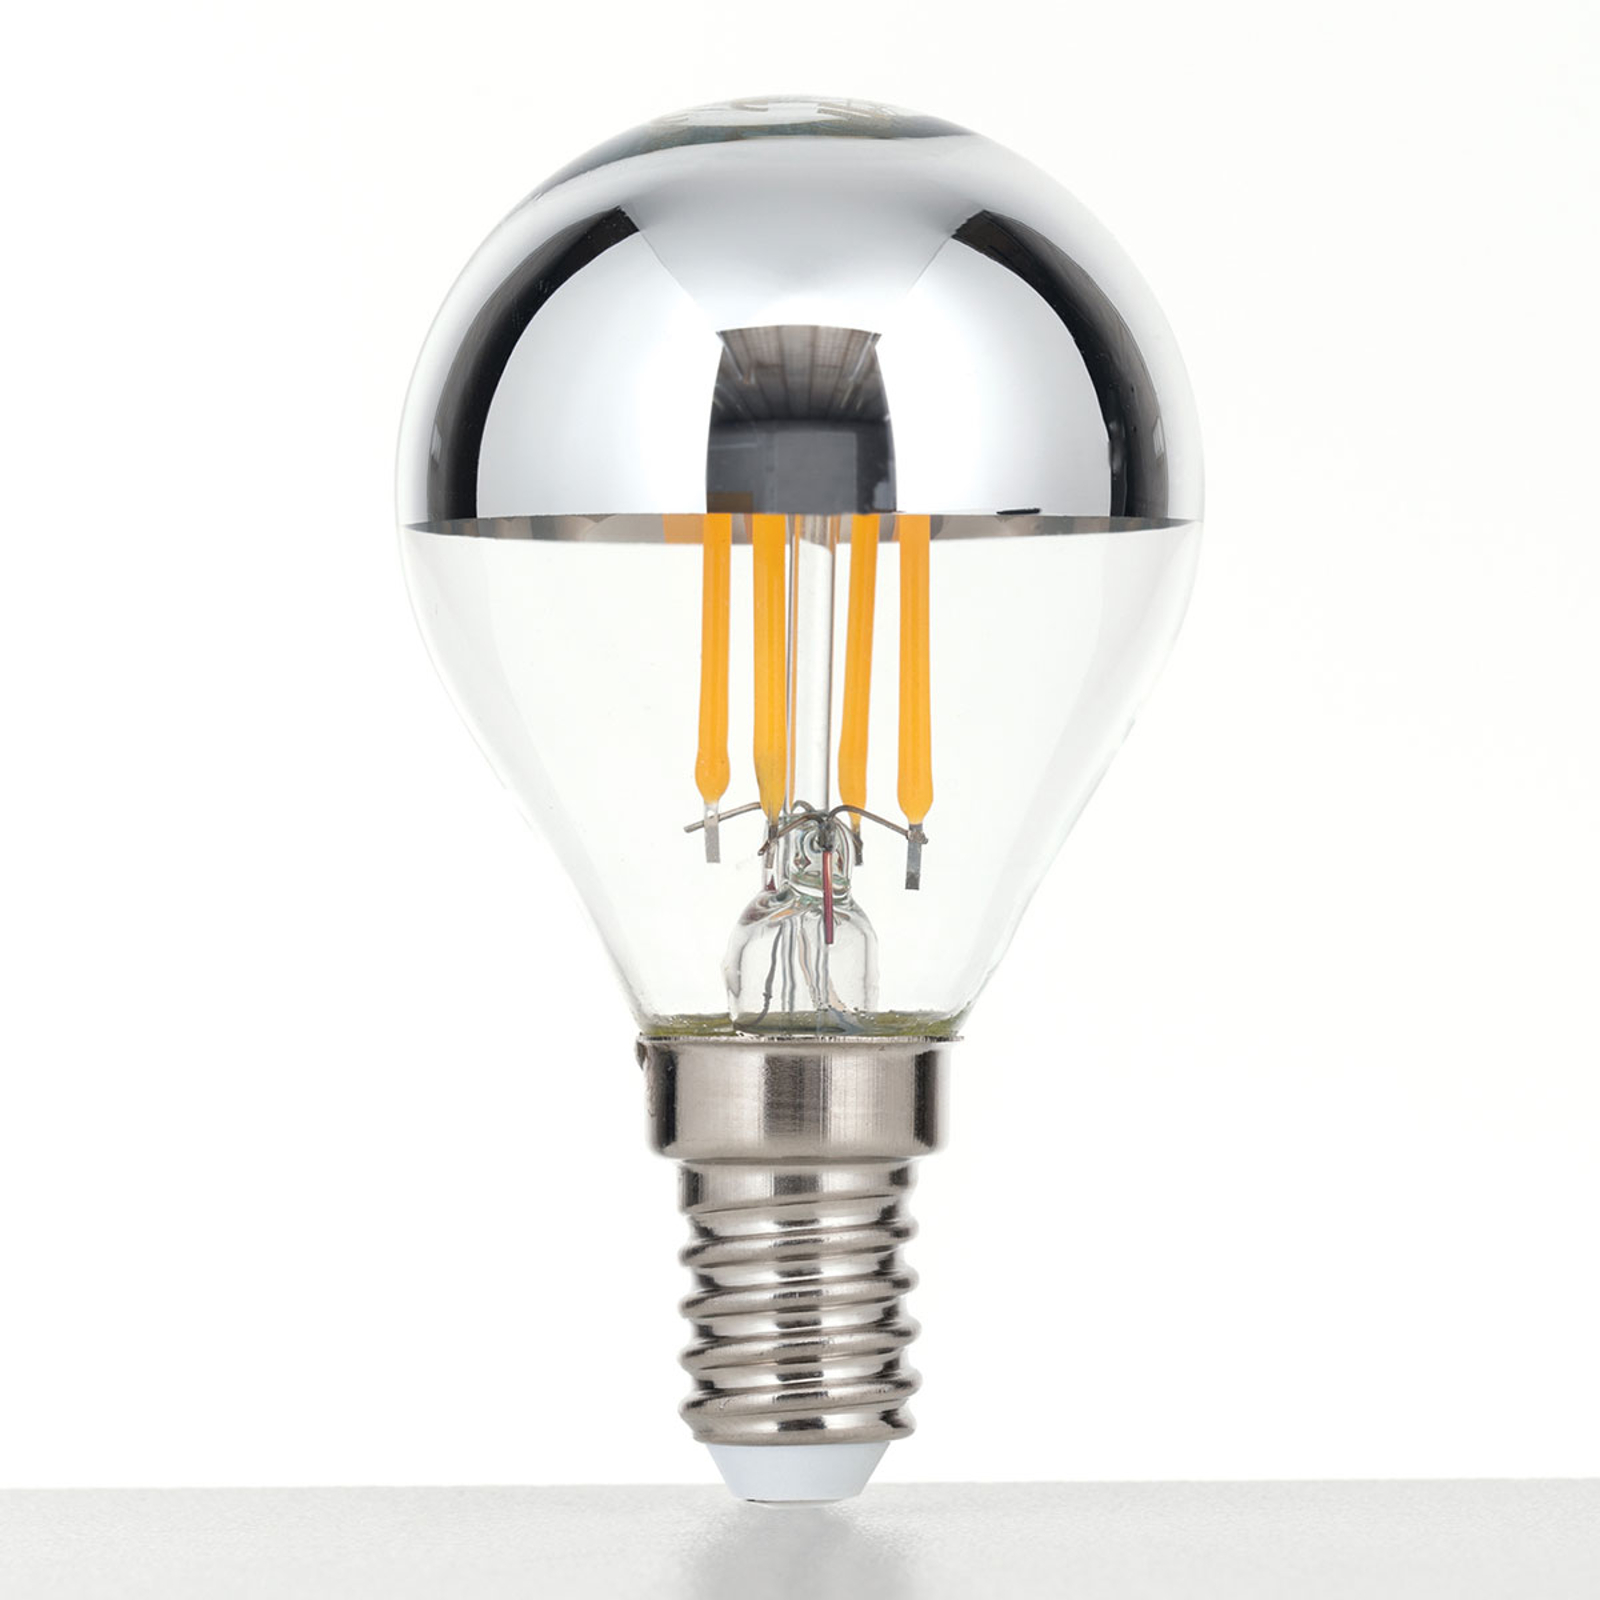 LED-Kopfspiegellampe E14 4W warmweiß, dimmbar kaufen